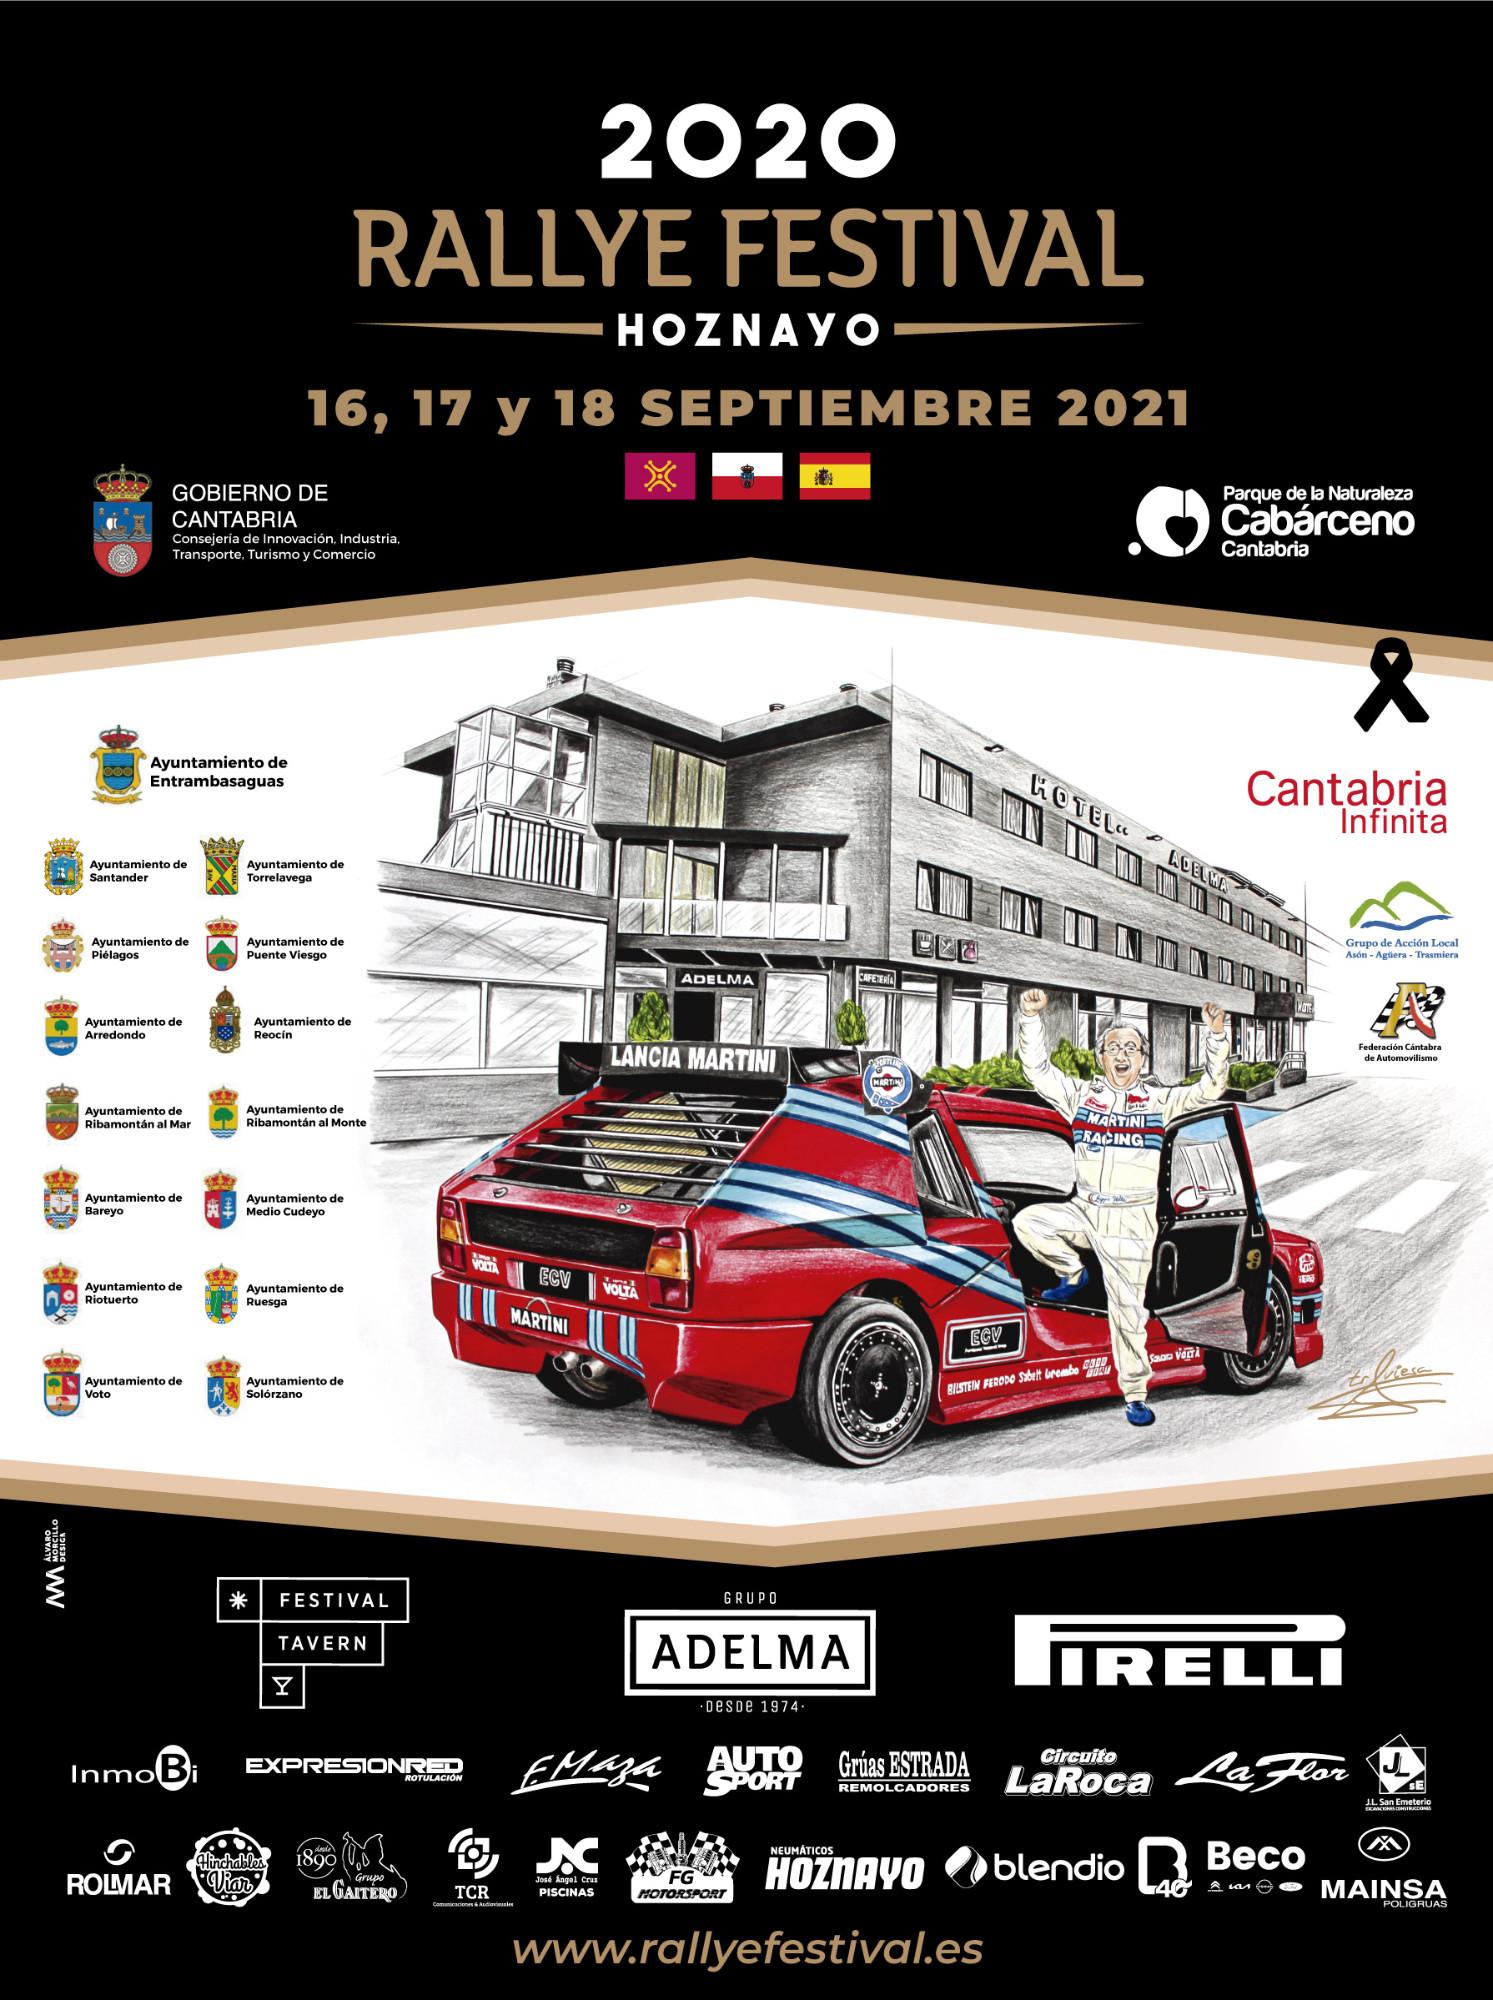 Rallye Festival Hoznayo 2021 [16-18 Septiembre] Cartel-hoznayo